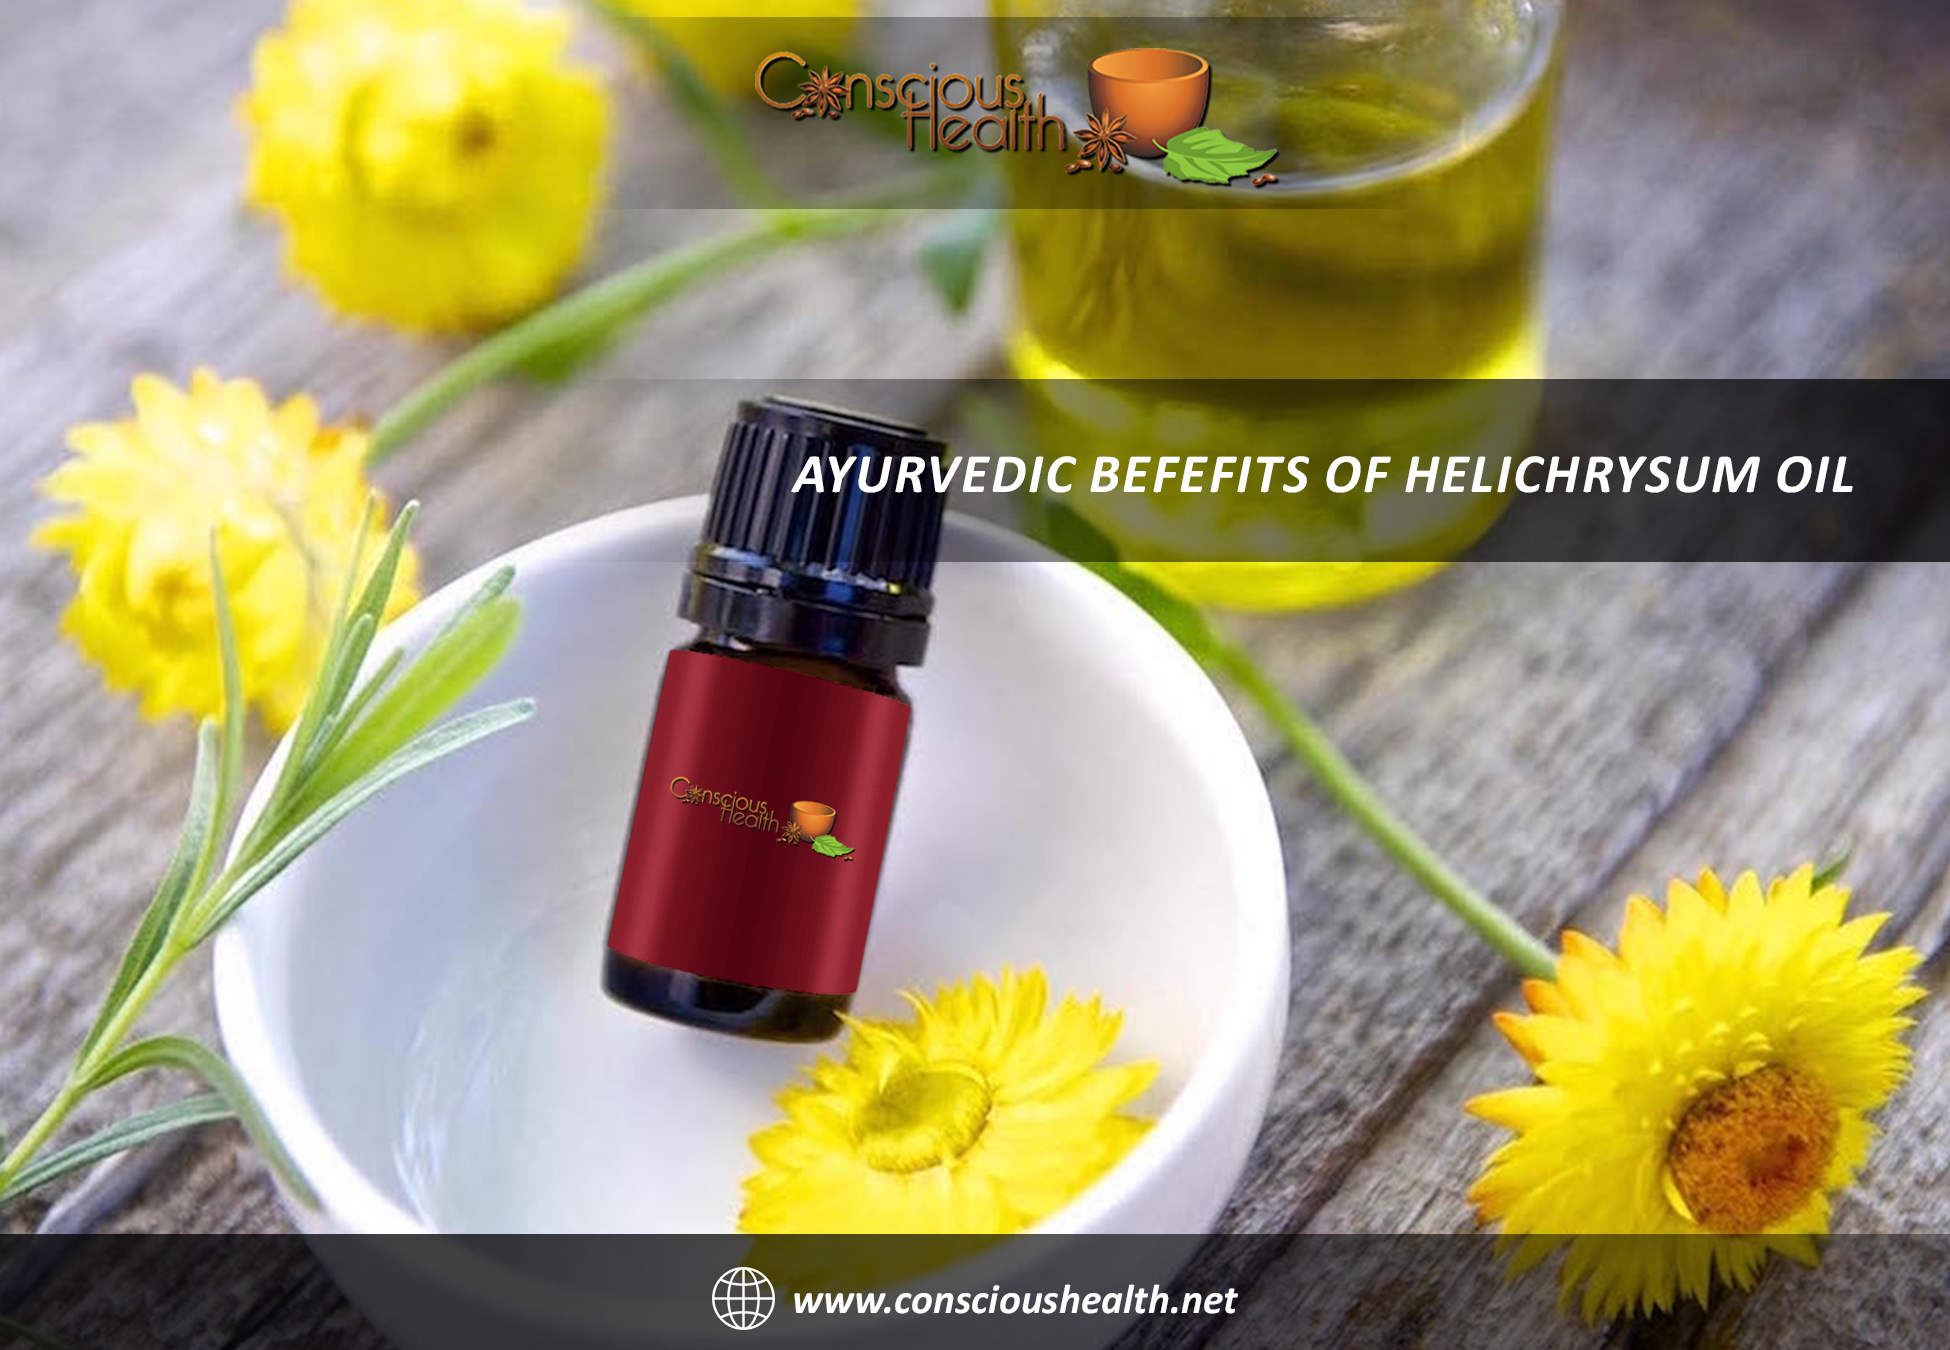 Ayurvedic Benefits Of Helichrysum Essential Oil